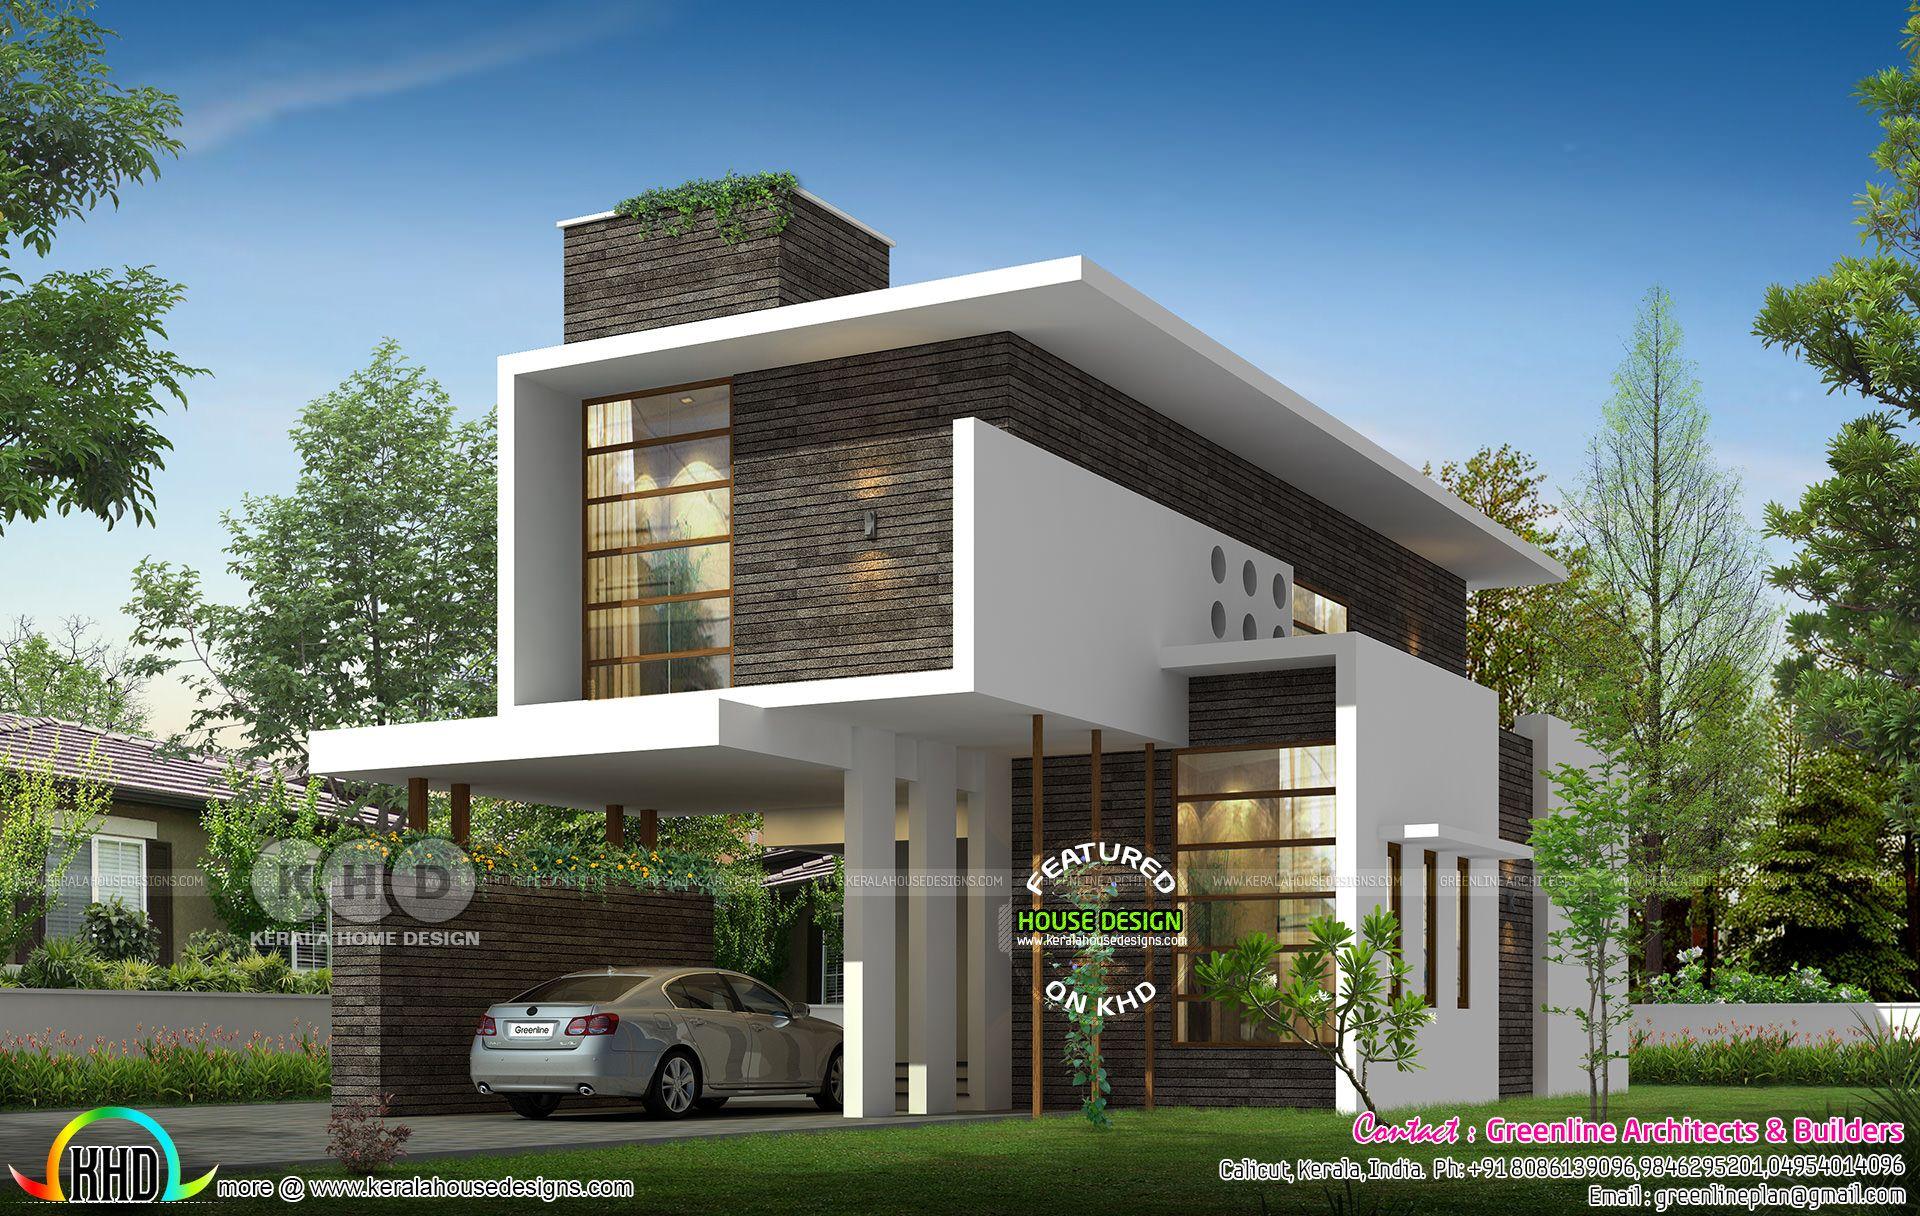 2210 Sq Ft 3 Bedroom New Generation House Plan Kerala House Design Bungalow House Design Home Building Design